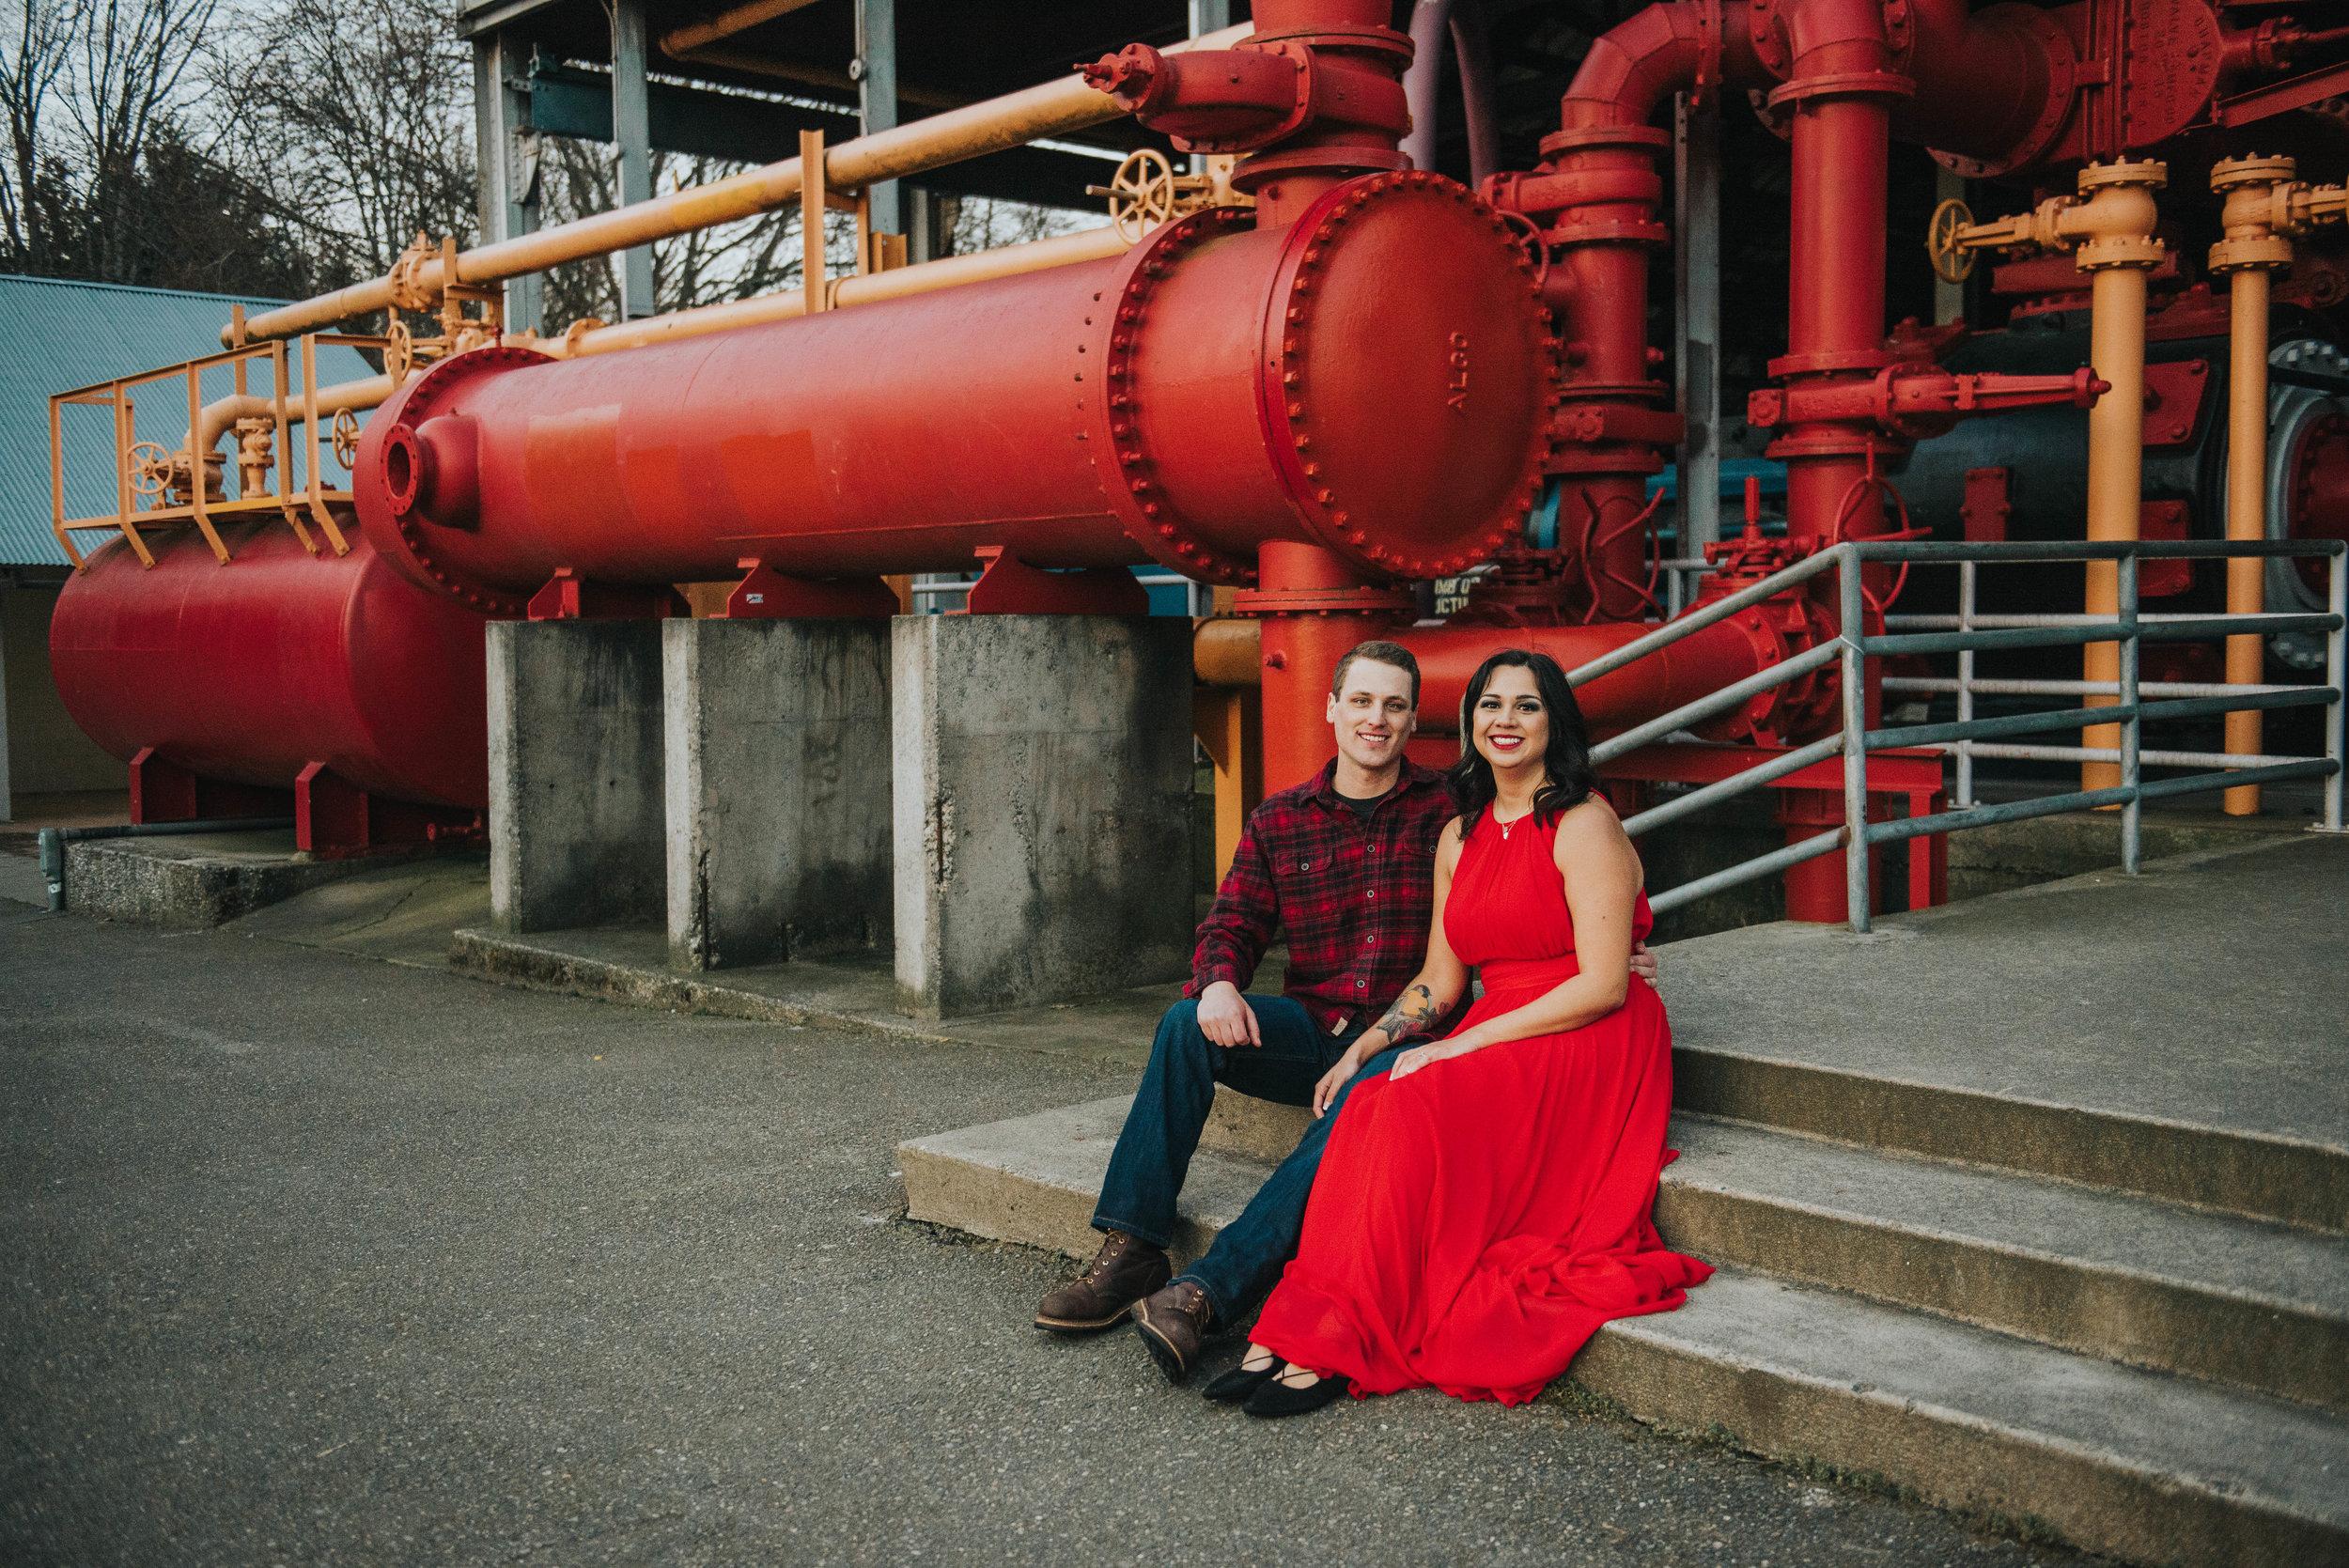 Oak-Harbor-Wedding-Photographer-J-Hodges (16 of 18).jpg